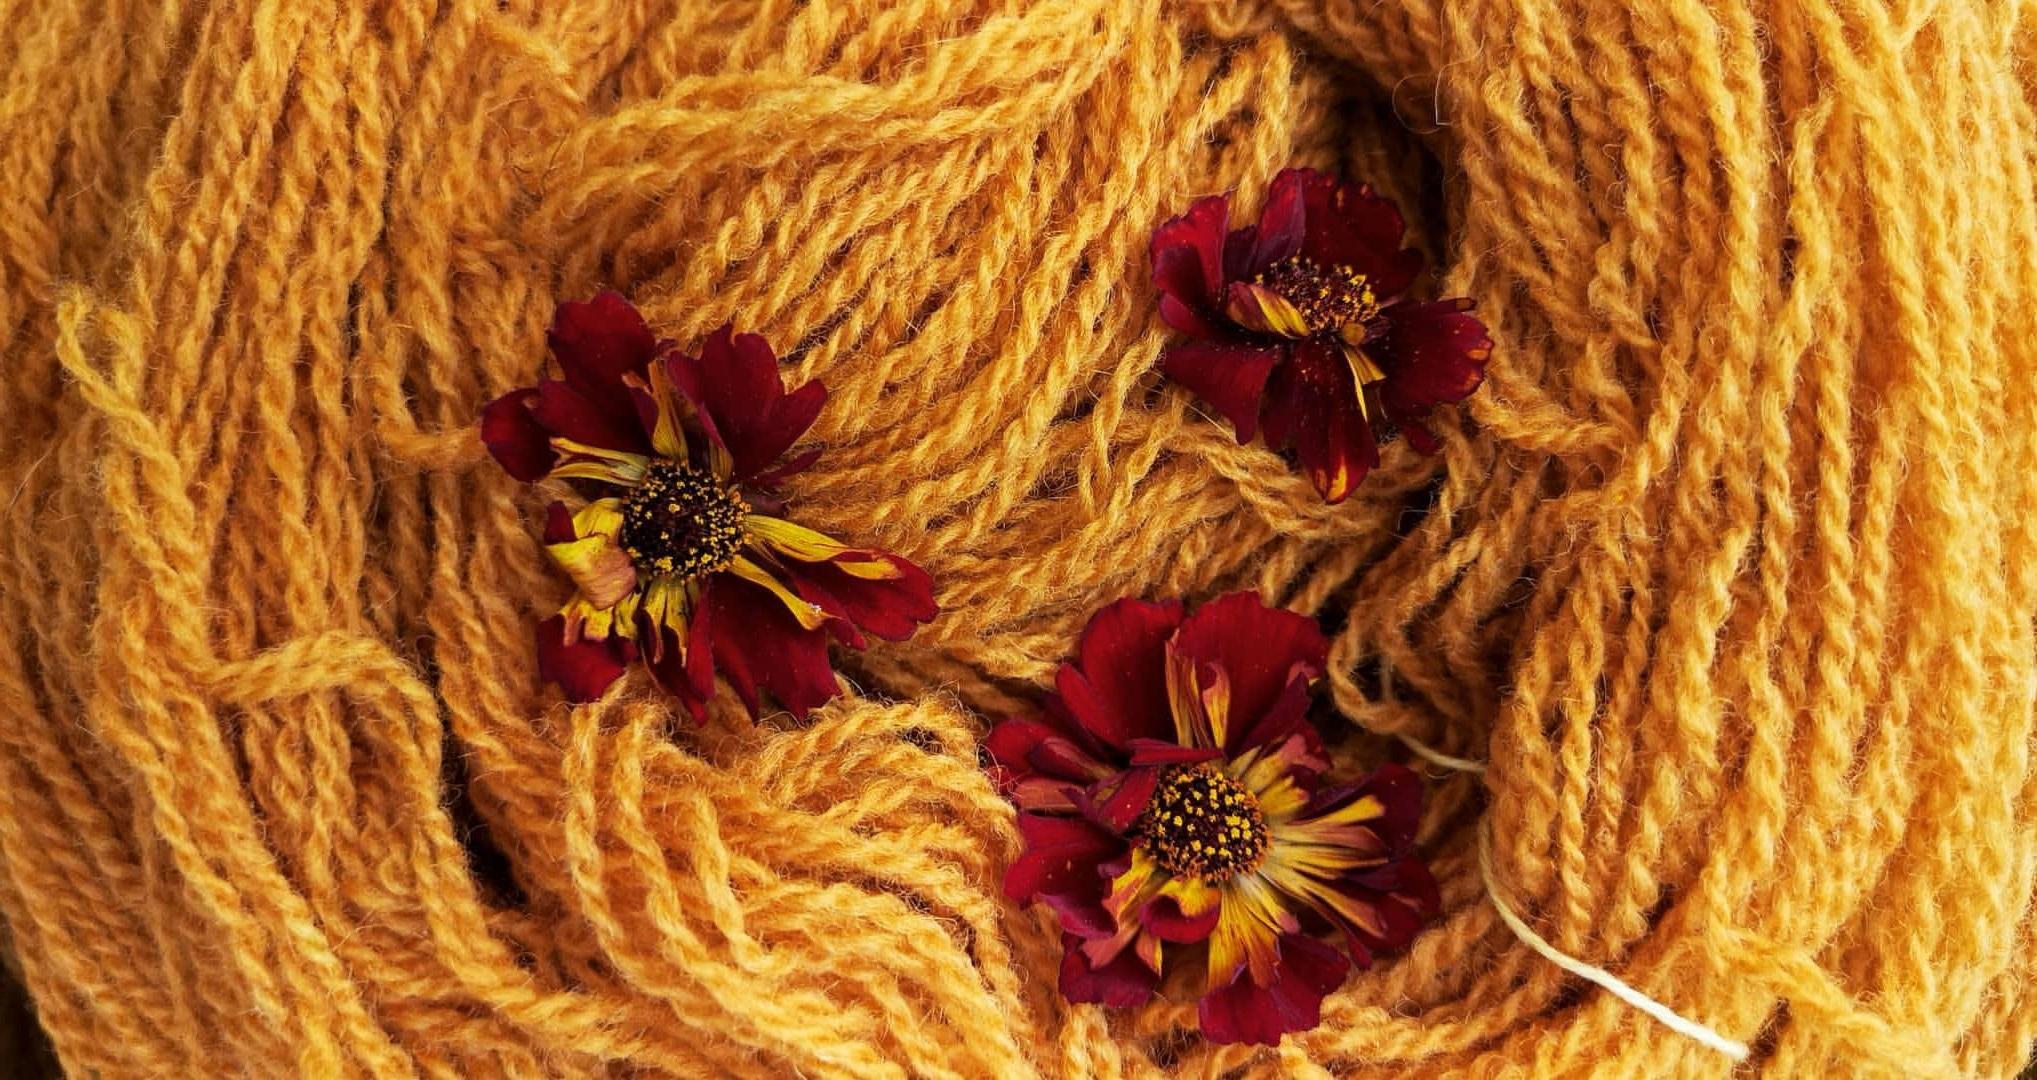 ria-burns-knitwear-coreopsis-tinctoria-roulette-flower-dye-6.jpg